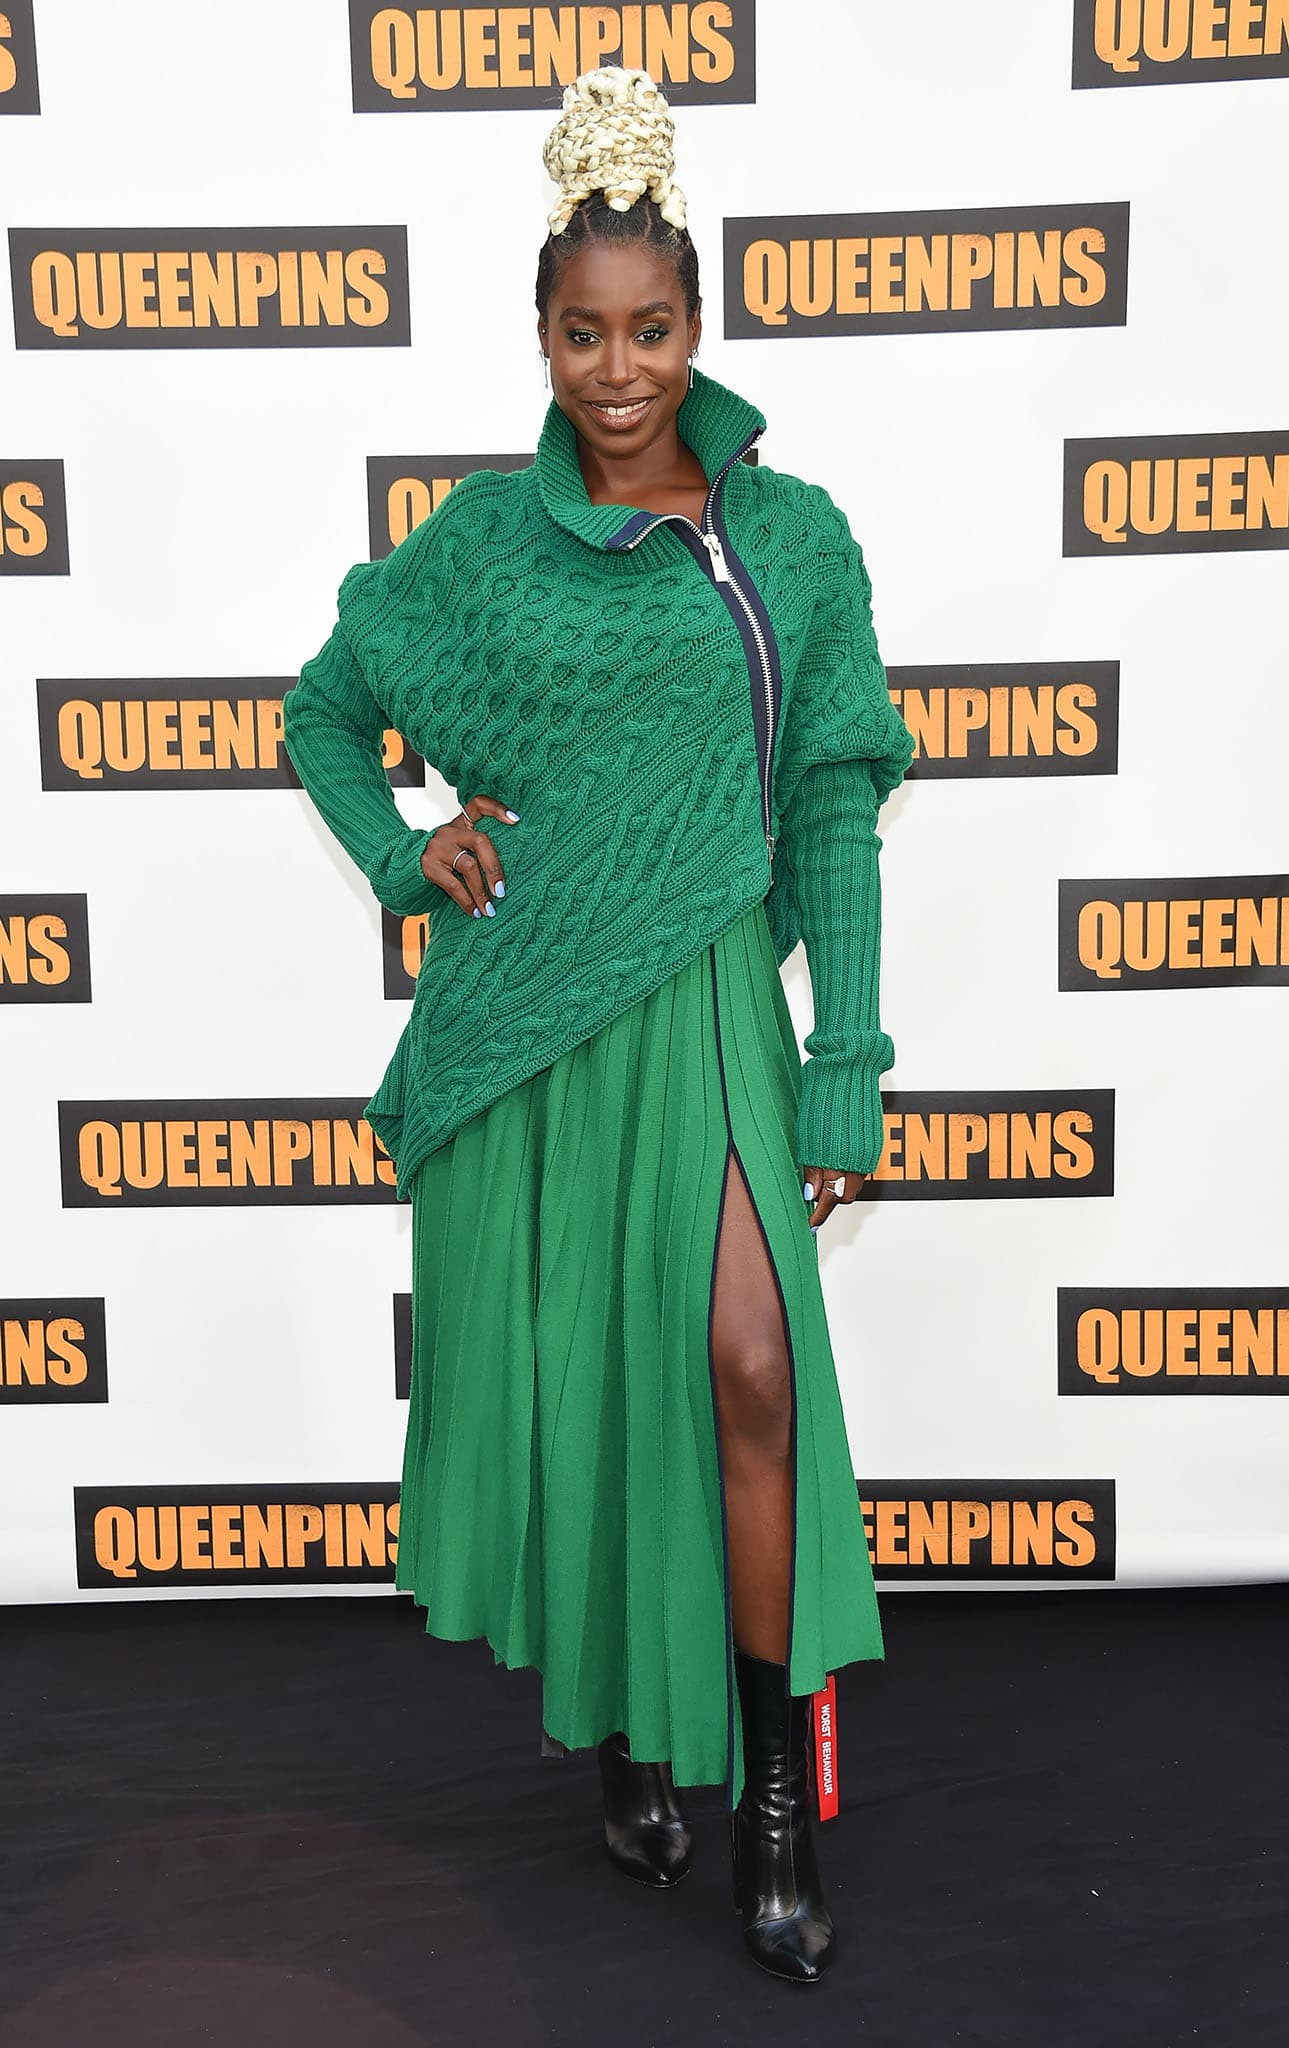 Kirby Howell-Baptiste wears a striking green sweater over a pleated dress